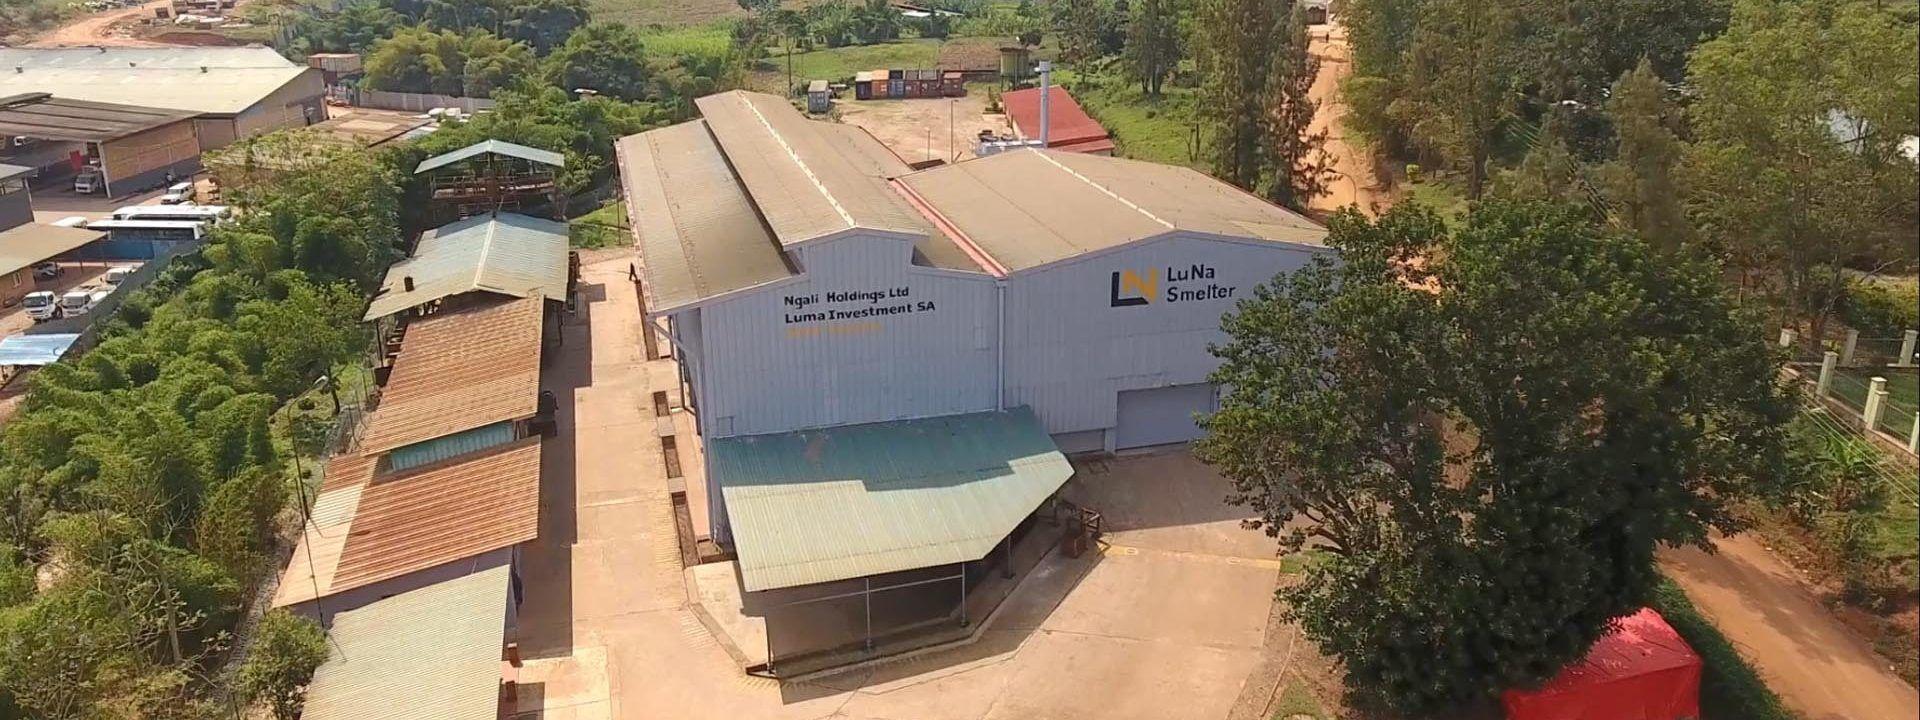 Rwandan smelter gets exploration green light - International Tin